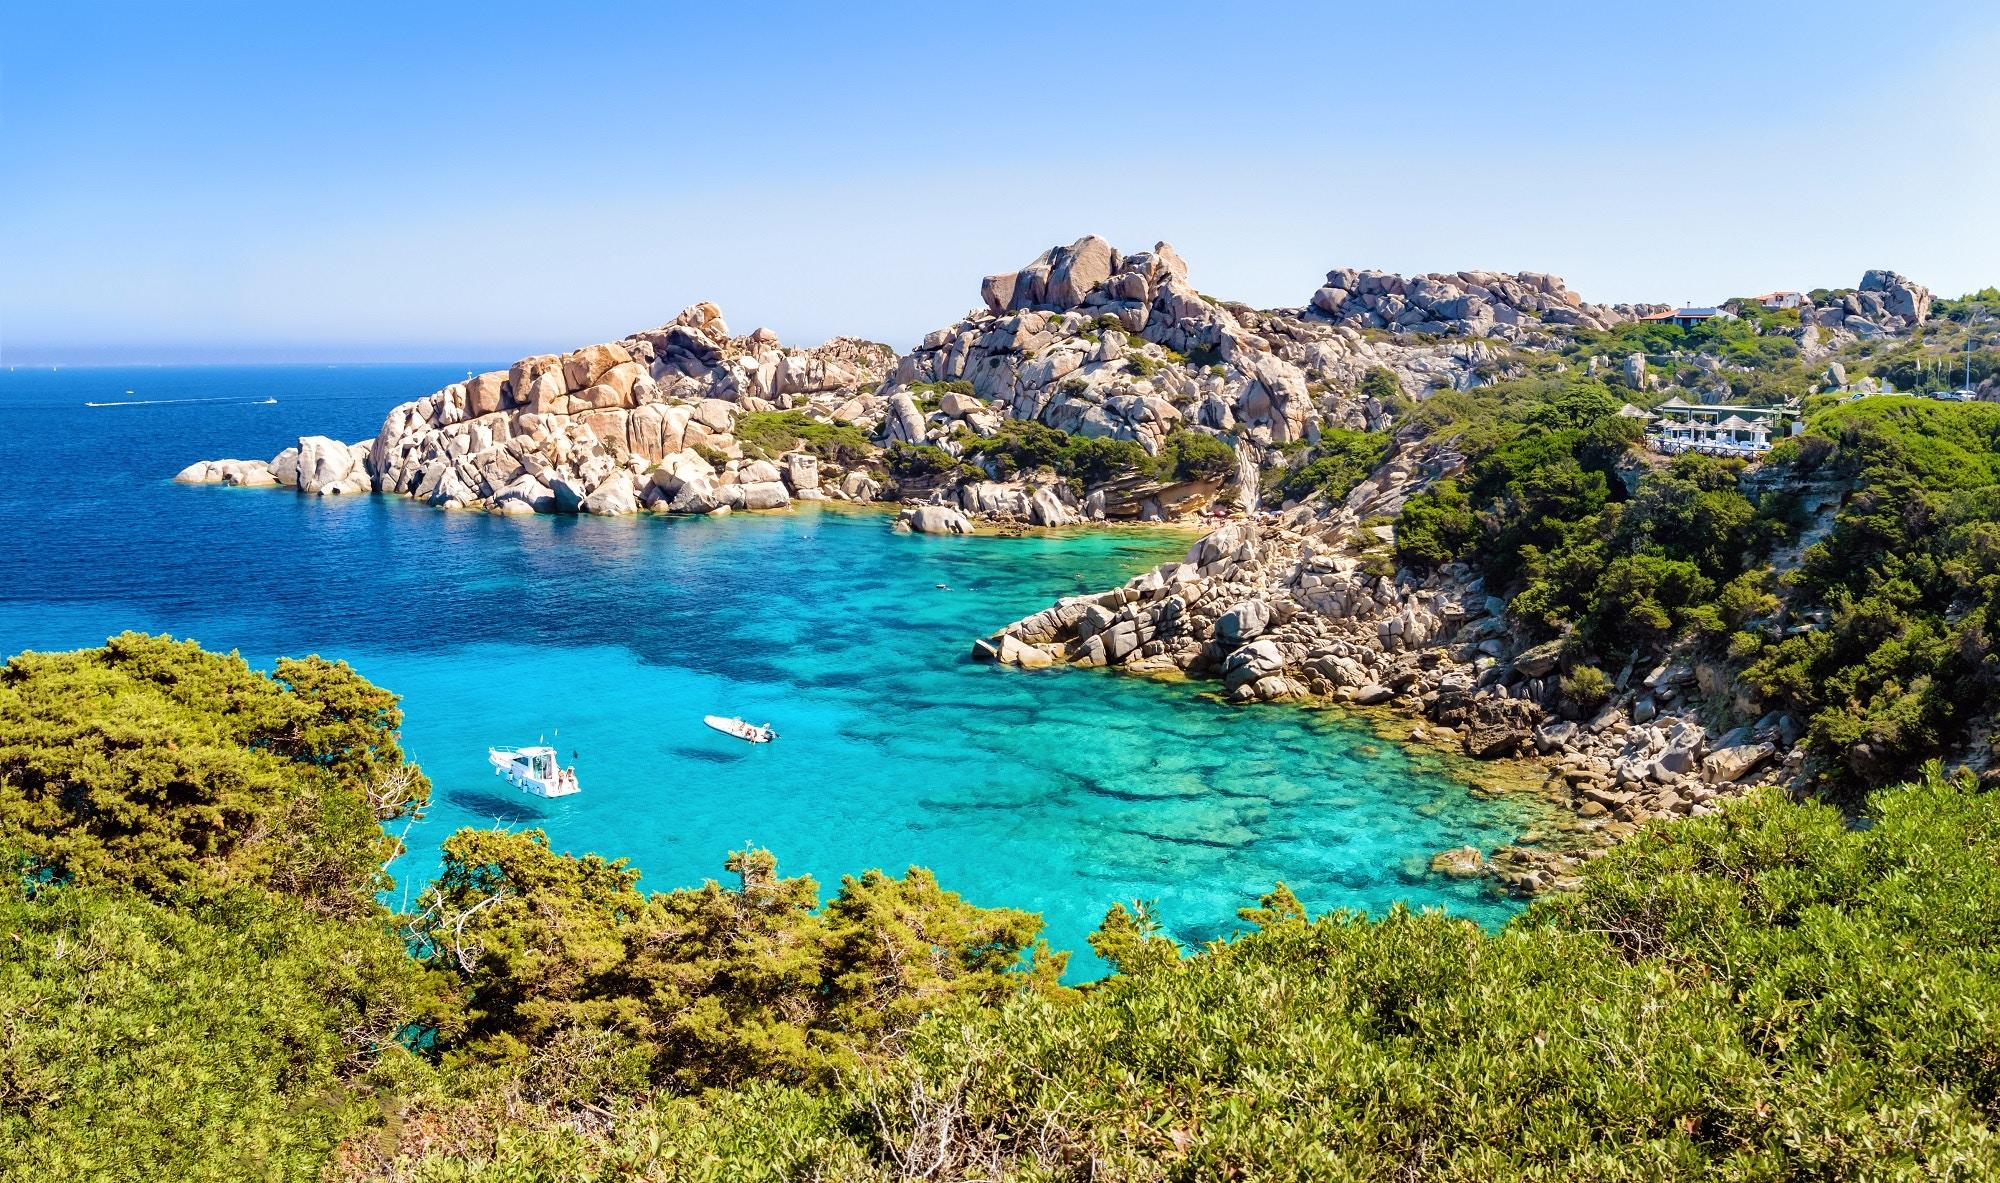 Sardinia's turquoise coastline © mitchFOTO / Shutterstock